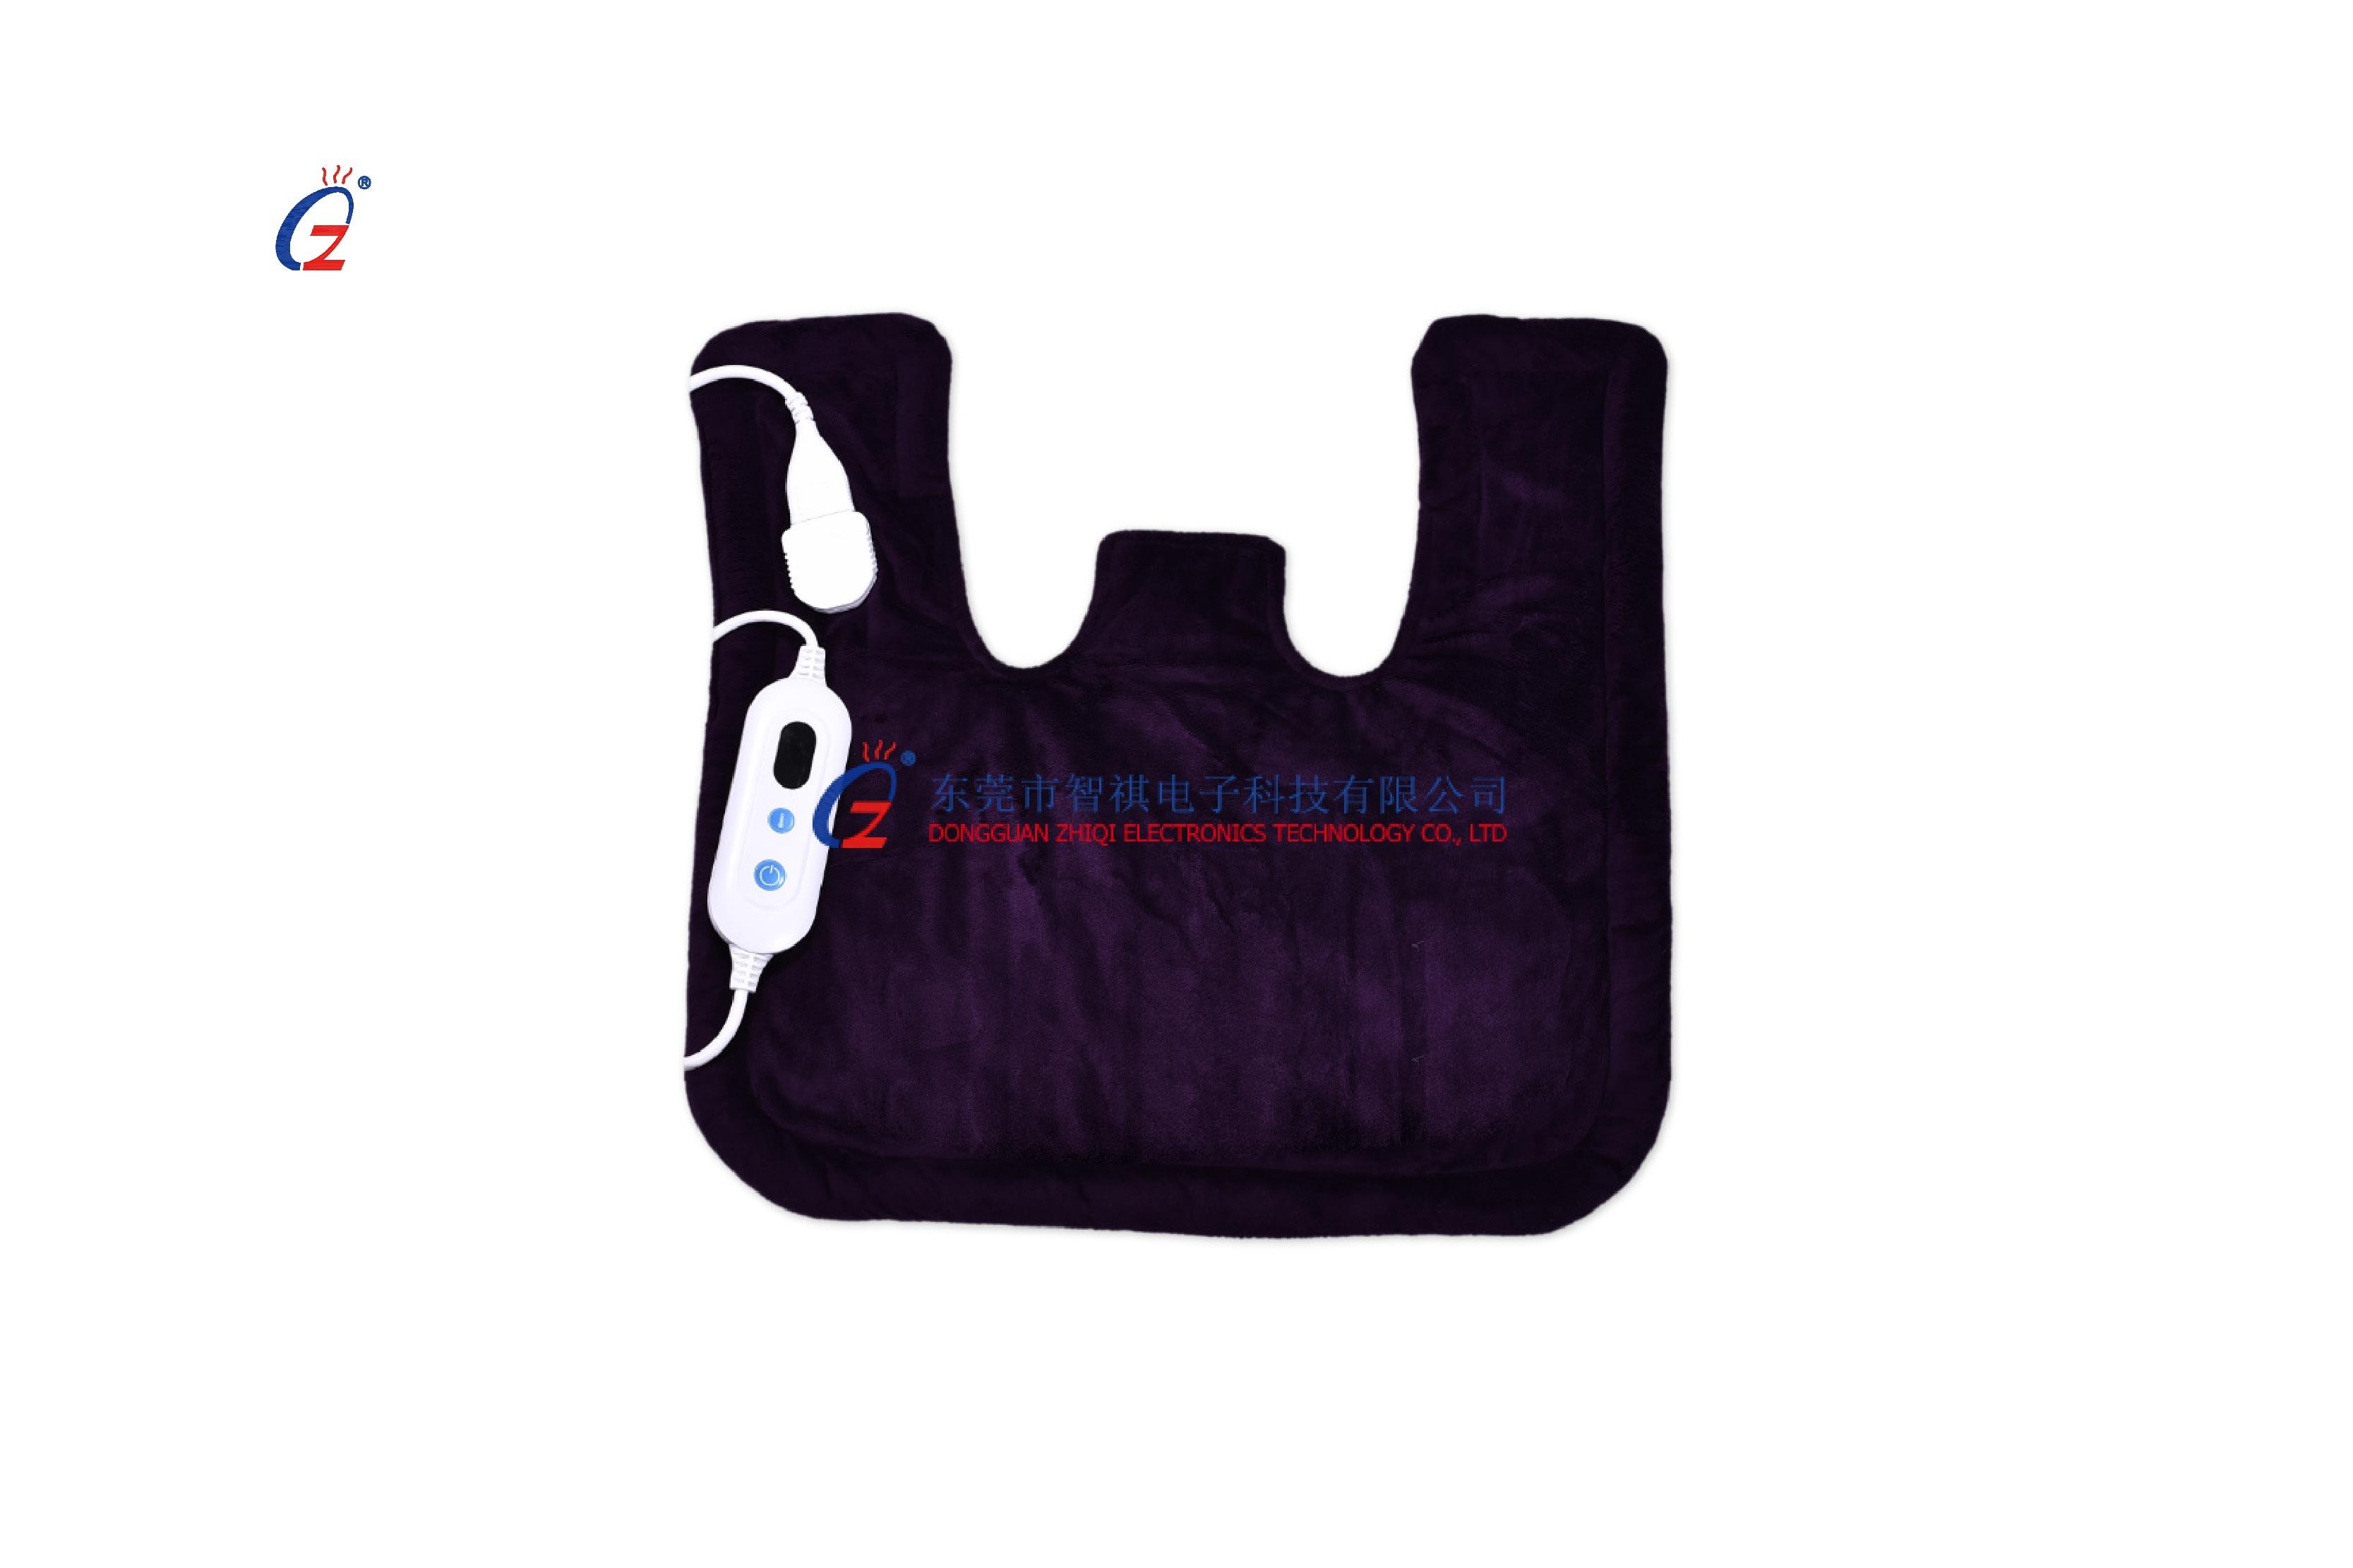 Hot selling neck and shoulder heat pad 4462 Dongguan Zhiqi Electronics